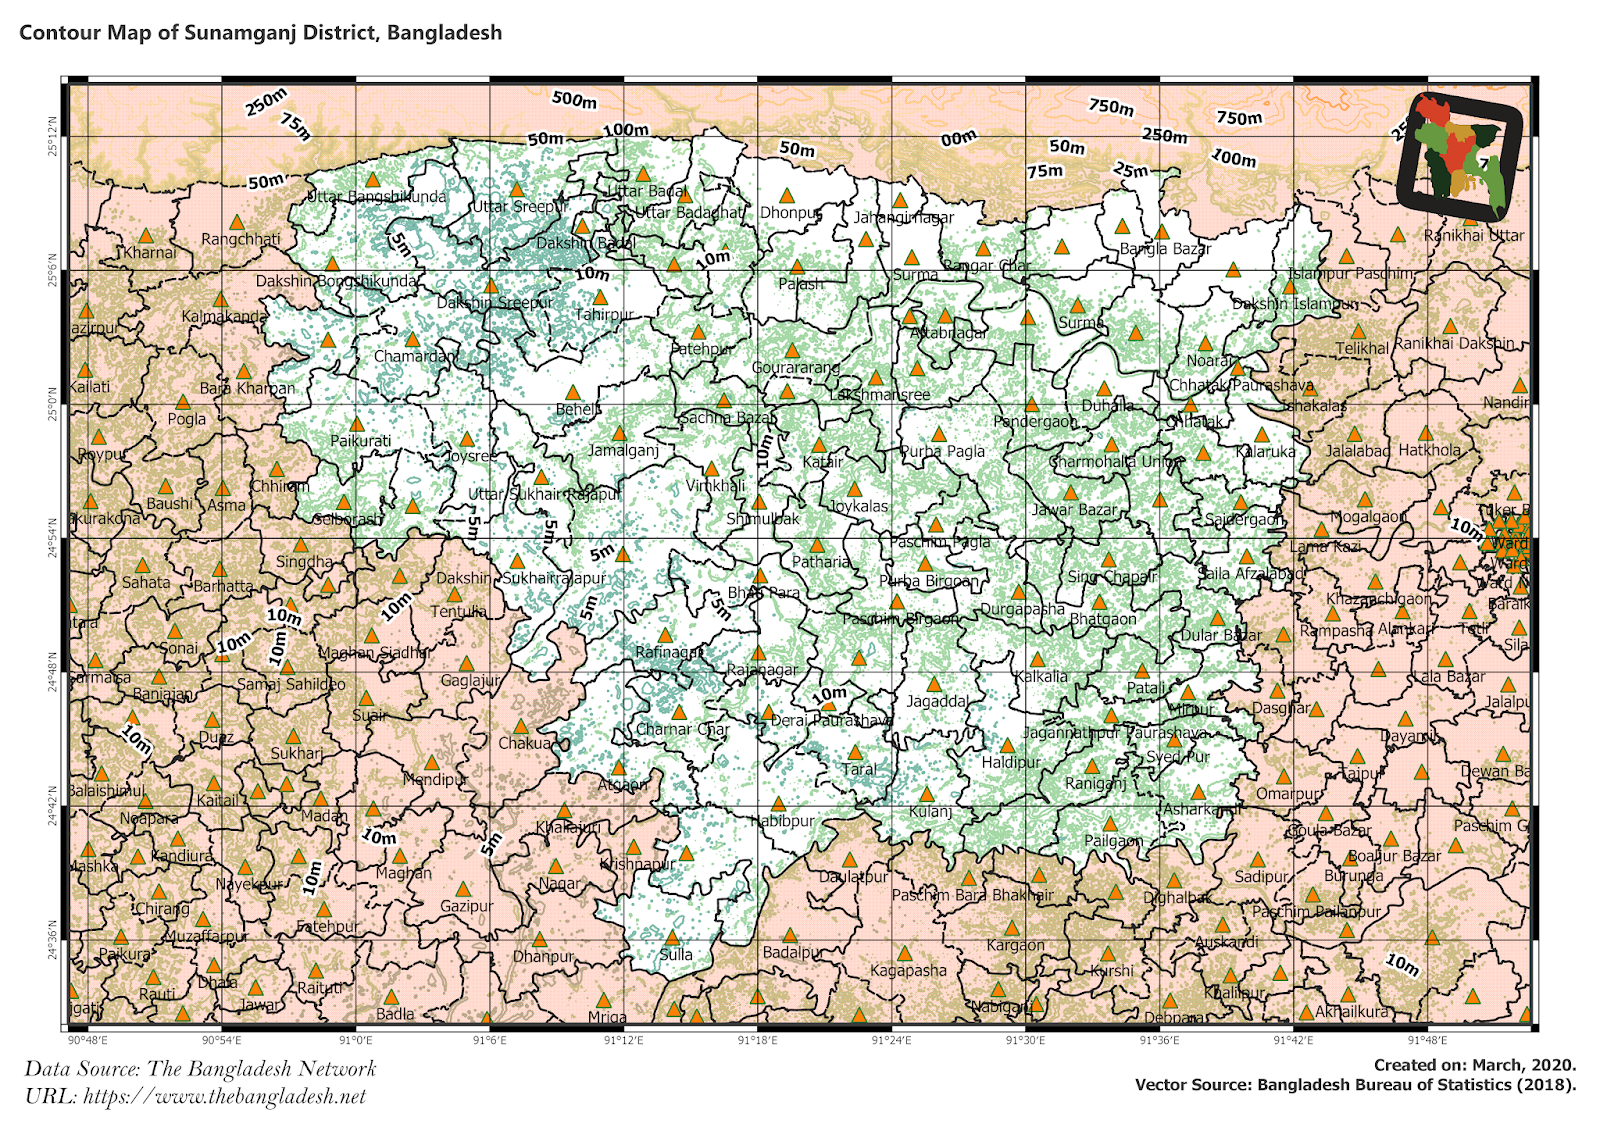 Elevation Map of Sunamganj District of Bangladesh